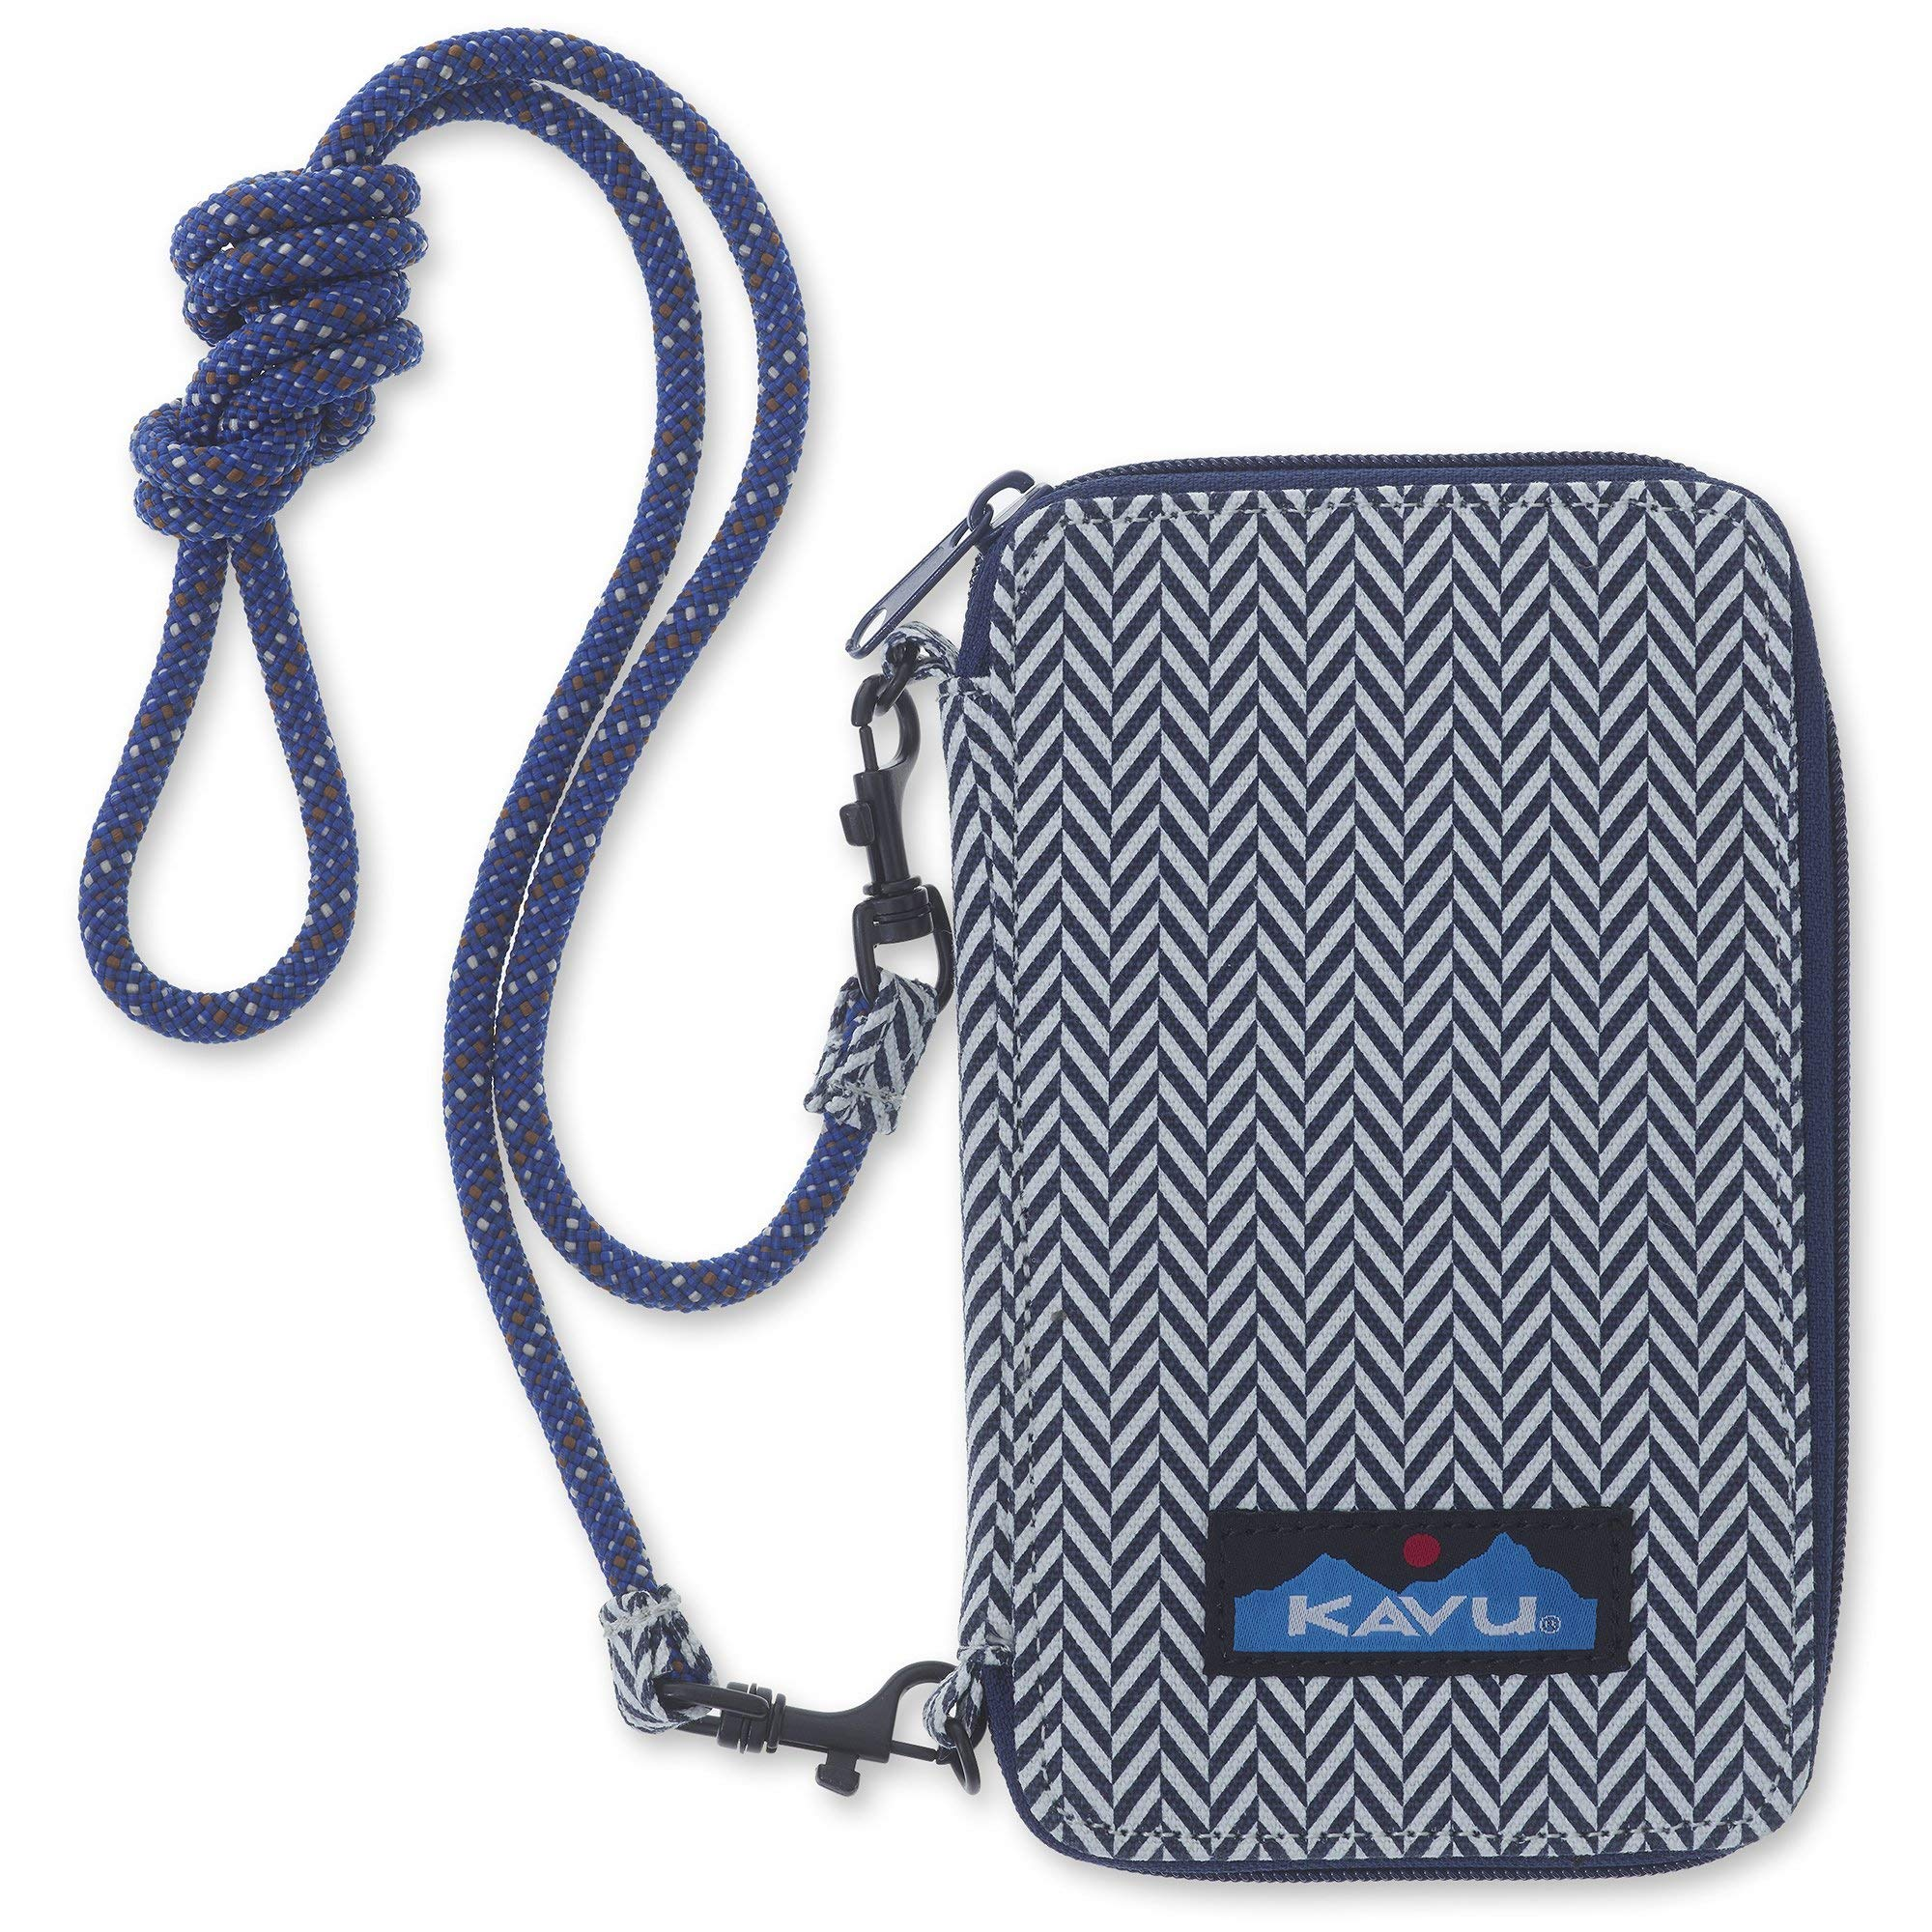 KAVU Go Time Bi-Fold Crossbody Wallet with Rope Strap - Herringbone by KAVU